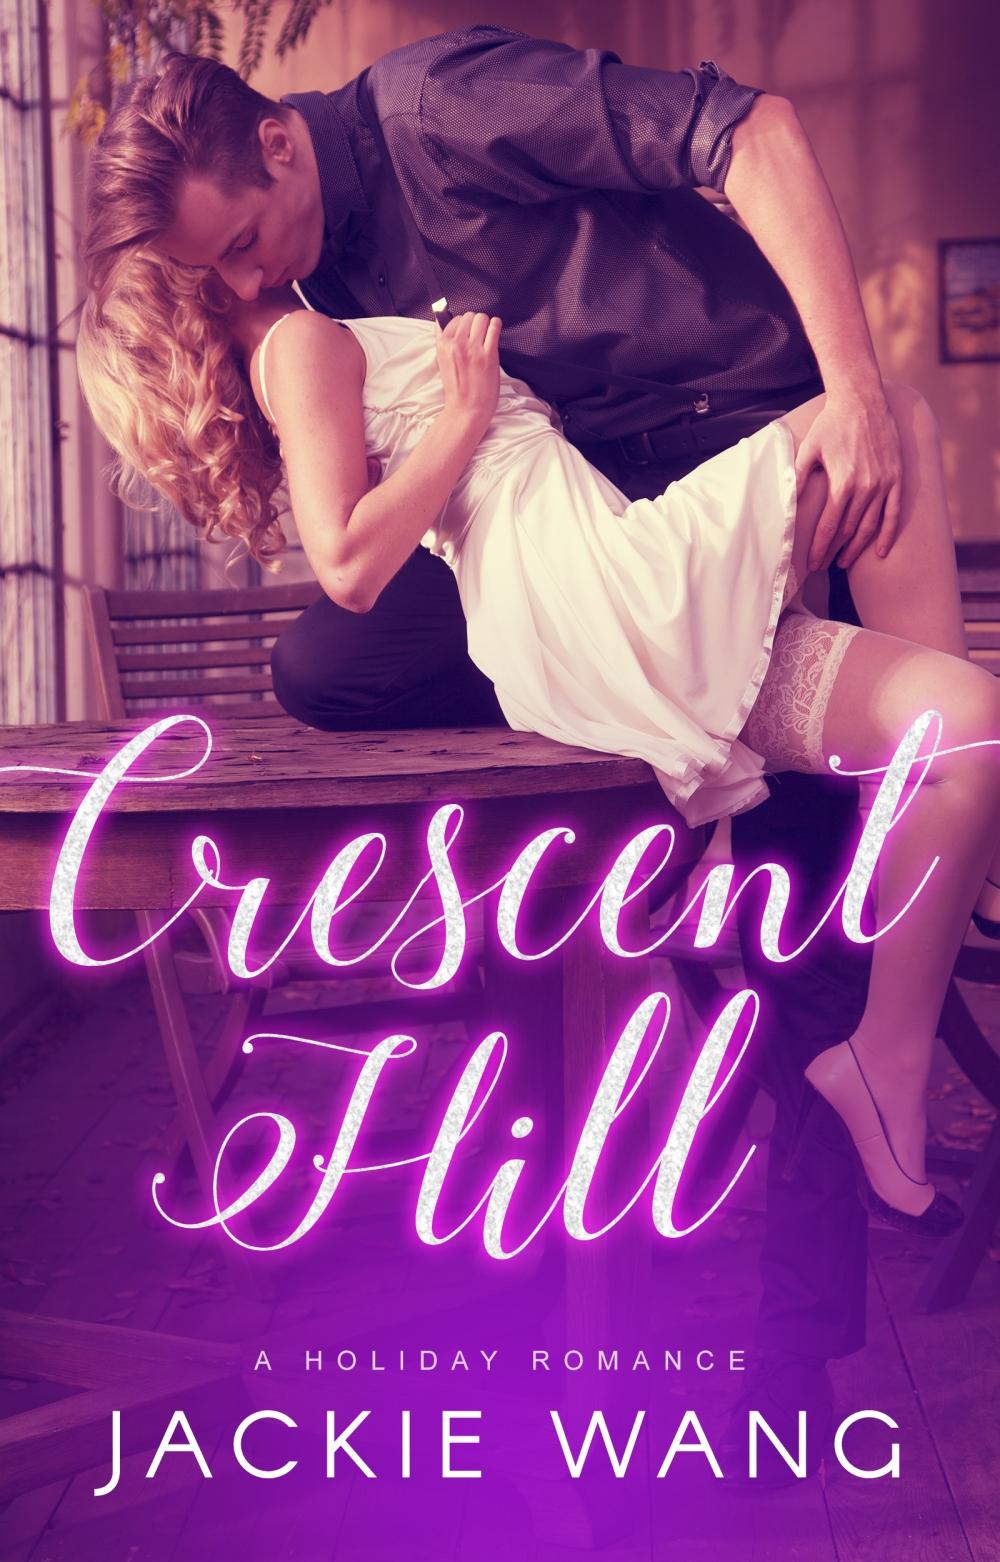 crescenthill